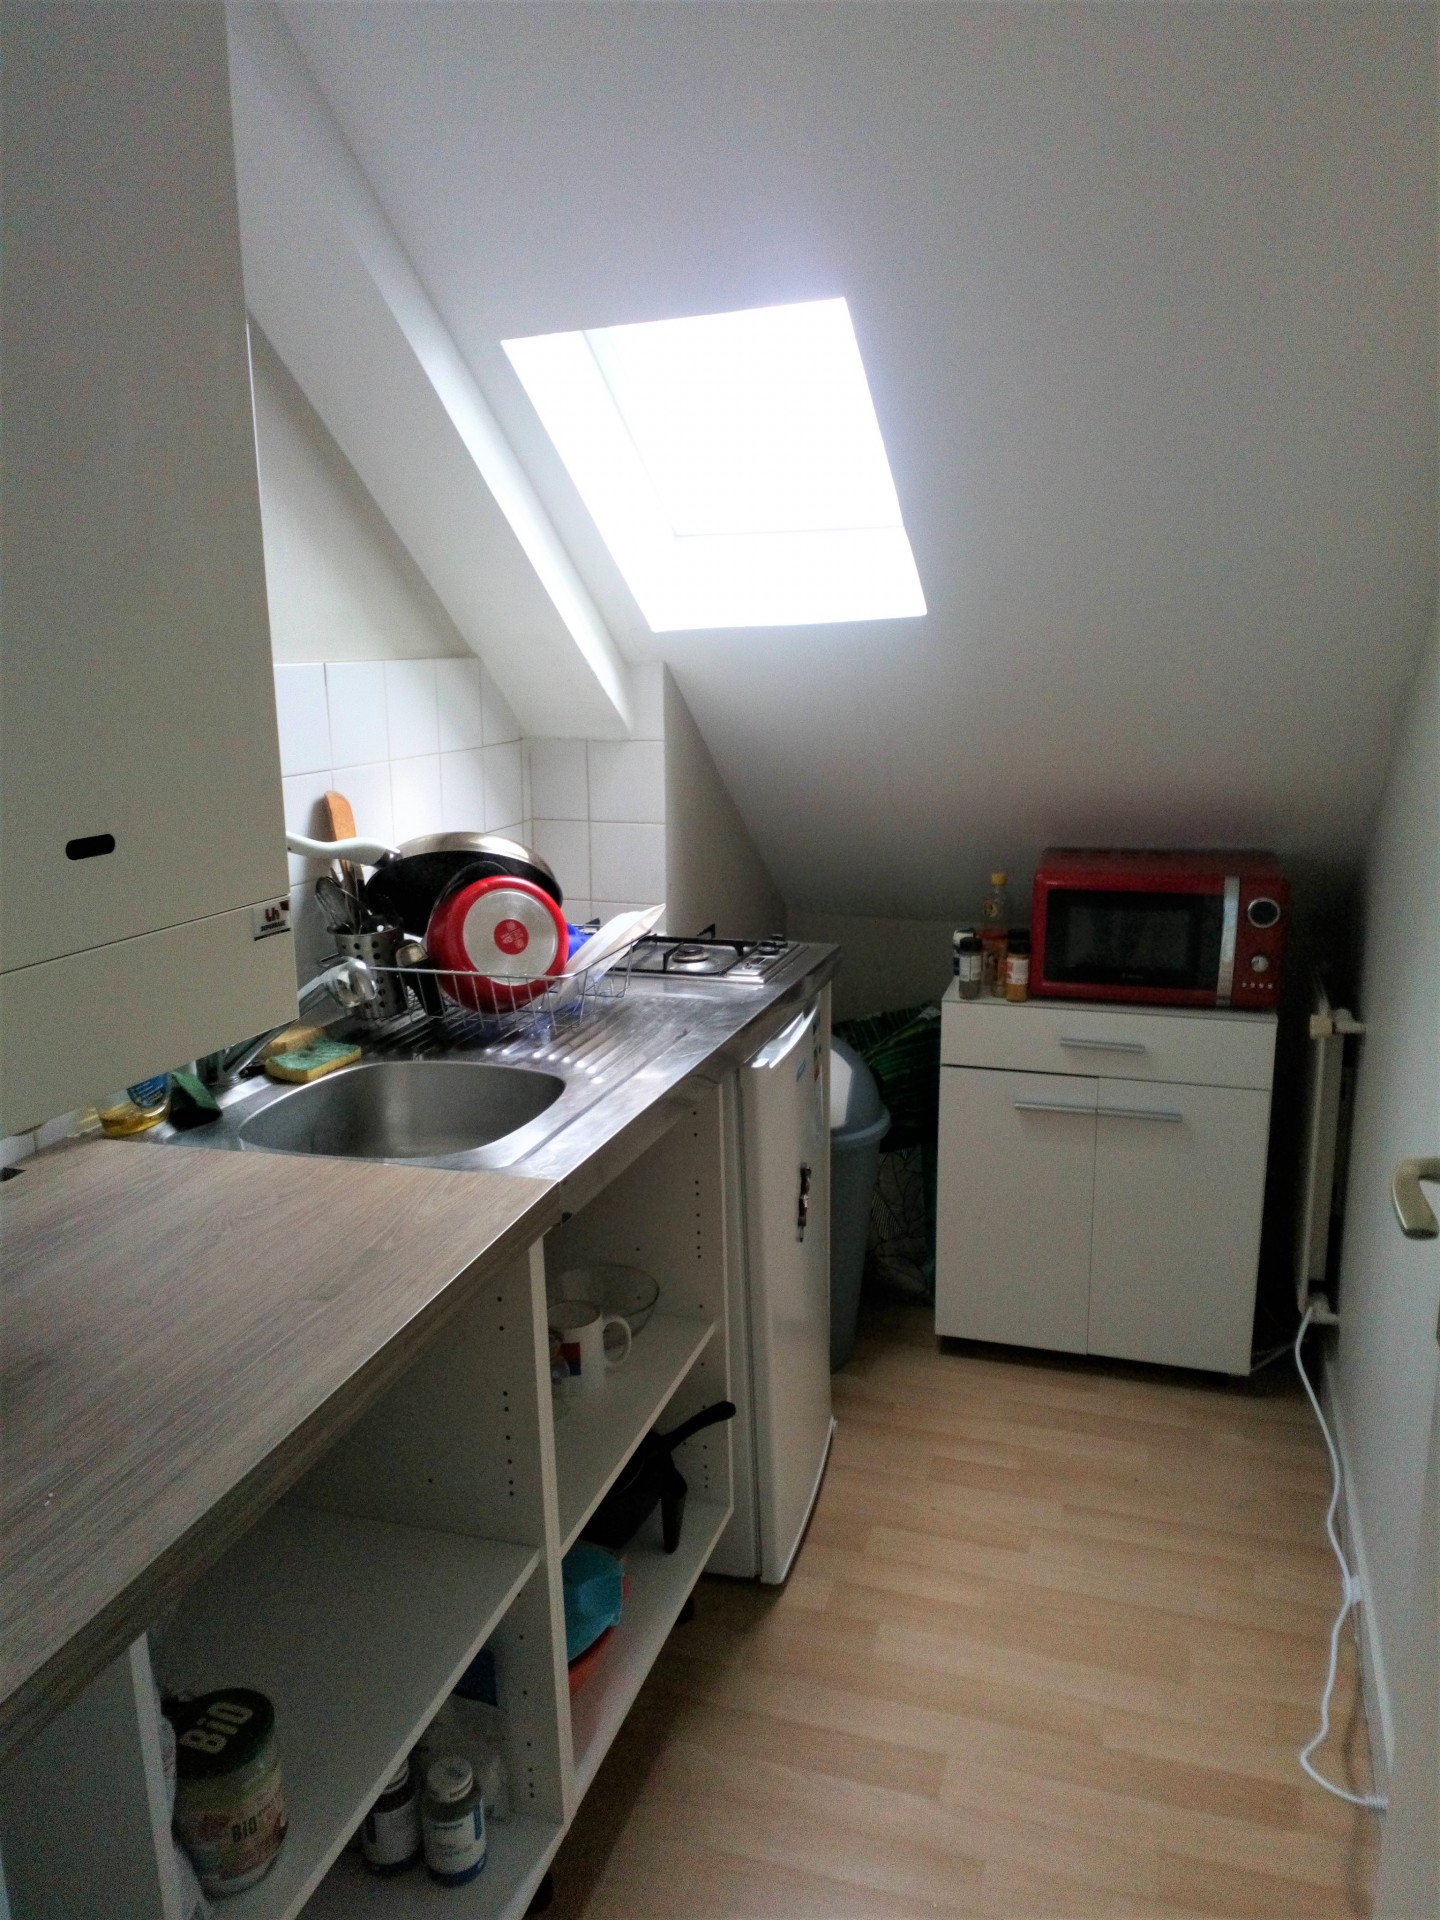 g-1483-n-cuisine-3504